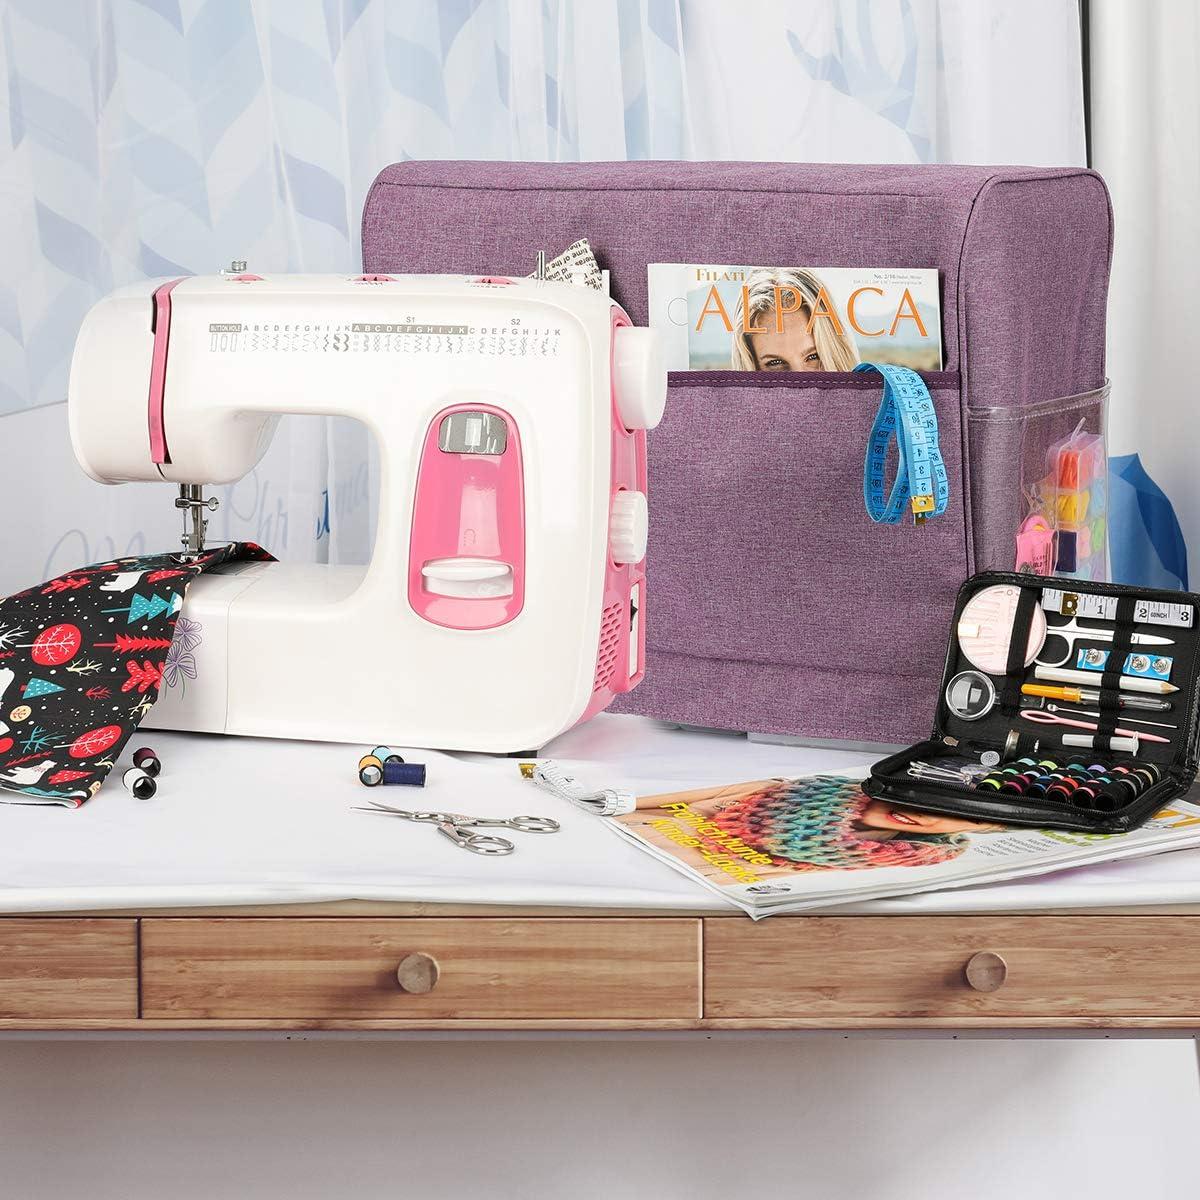 TopHGC - Funda protectora para máquina de coser, fácil de guardar ...